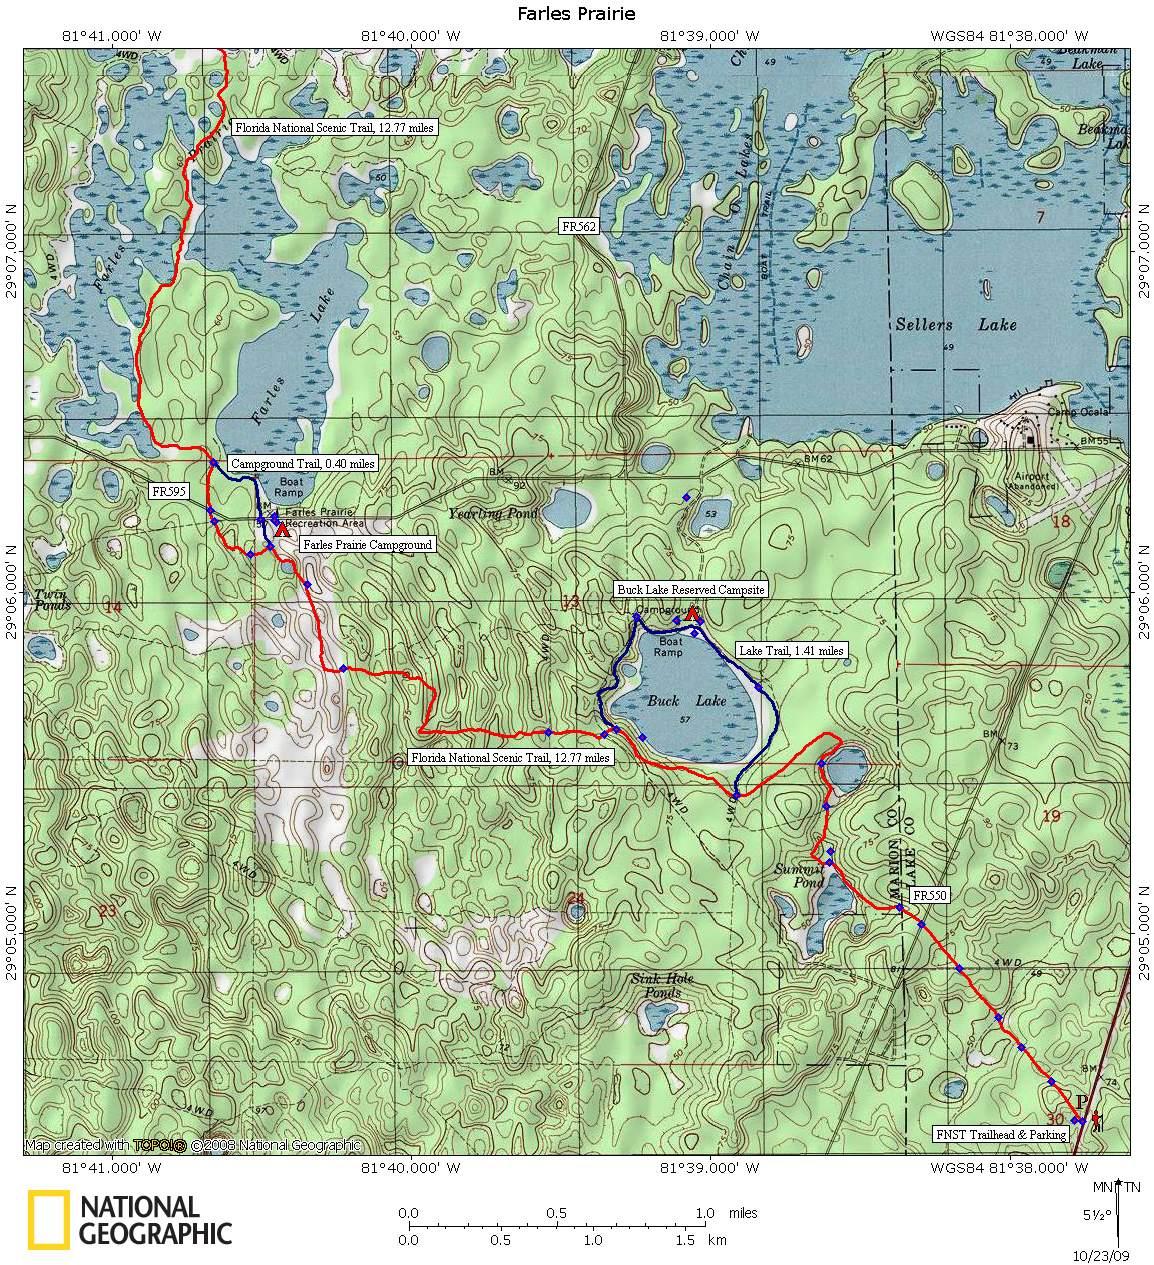 Ocala National Forest - Farles Prairie - Florida Trail Maps Download